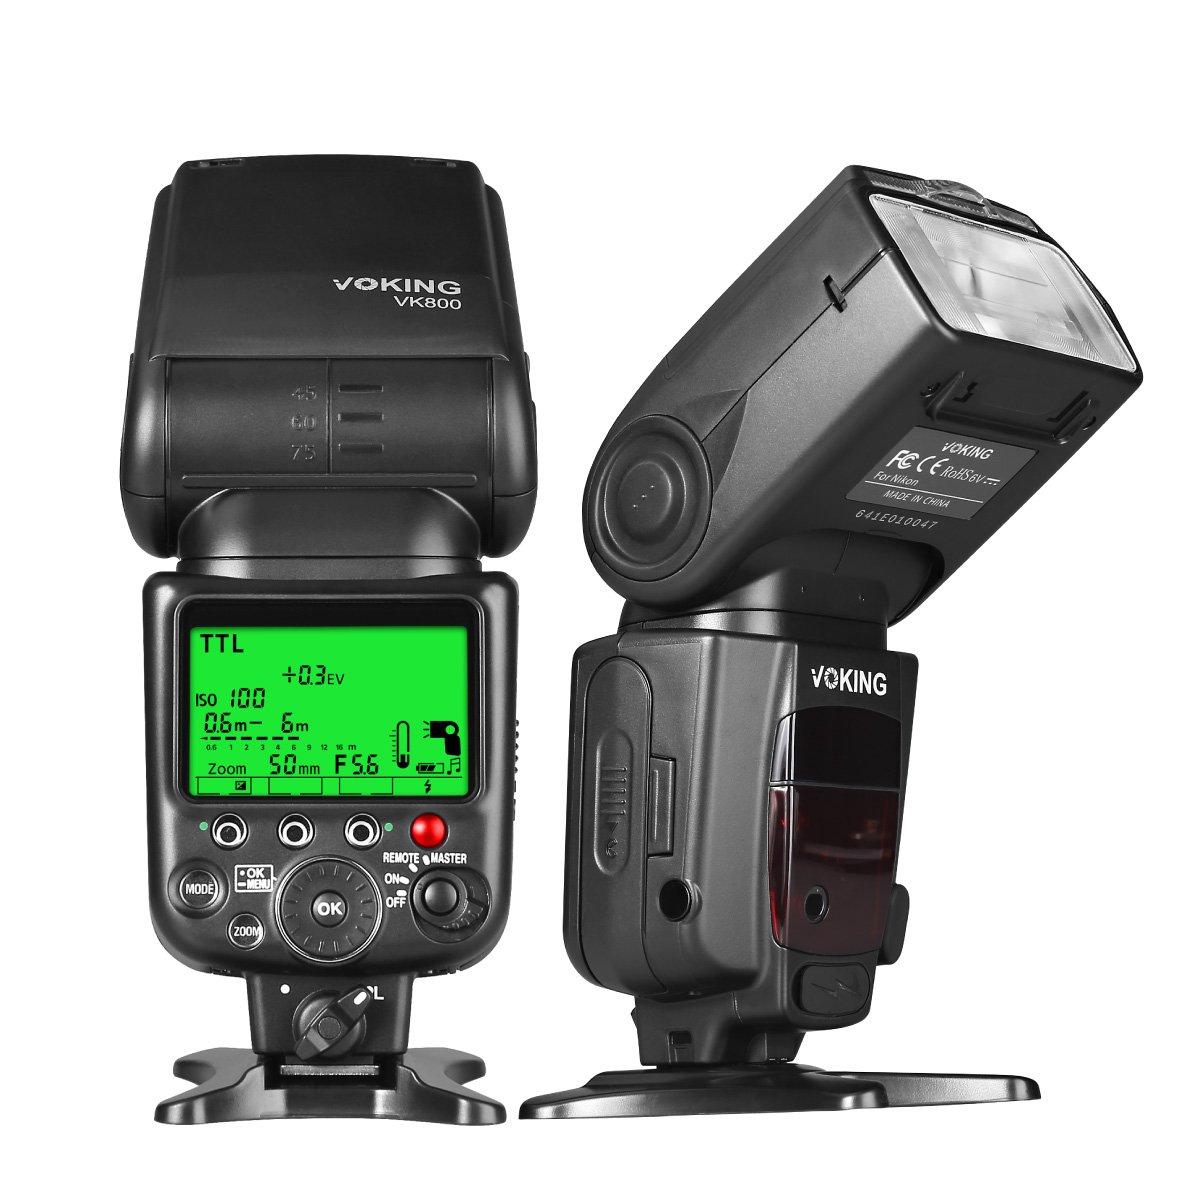 Voking VK800 I TTL External Camera Flash Slave Speelite for Nikon D3400 D3300 D3200 D5600 D850 D750 D7200 D5300 D5500 D500 D7100 D3100 and other Digital SLR Cameras